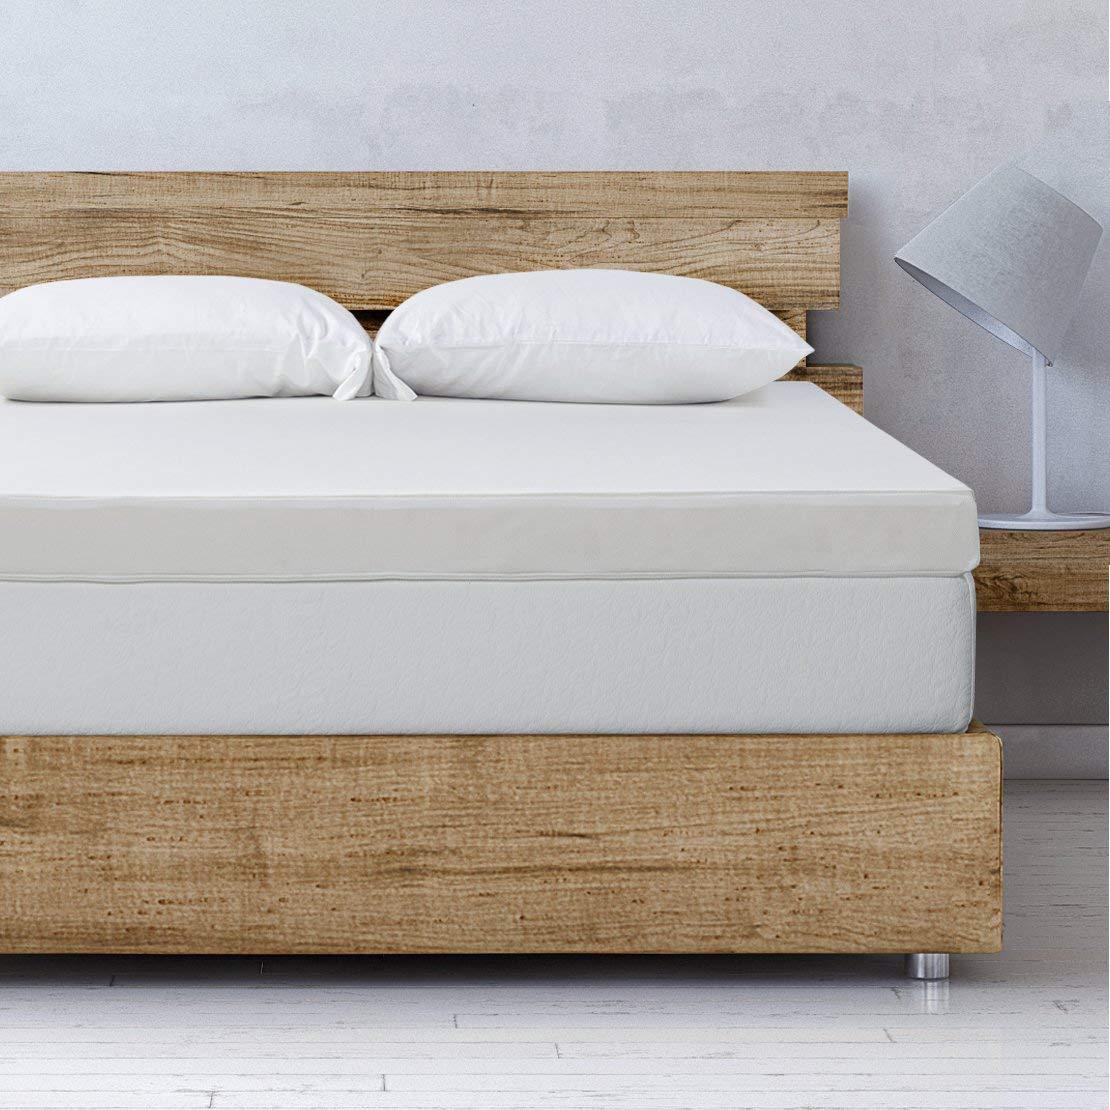 Best Price Mattress Twin Mattress Topper - 4 Inch Memory Foam Bed Topper Cover Cooling Mattress Pad, Twin Size